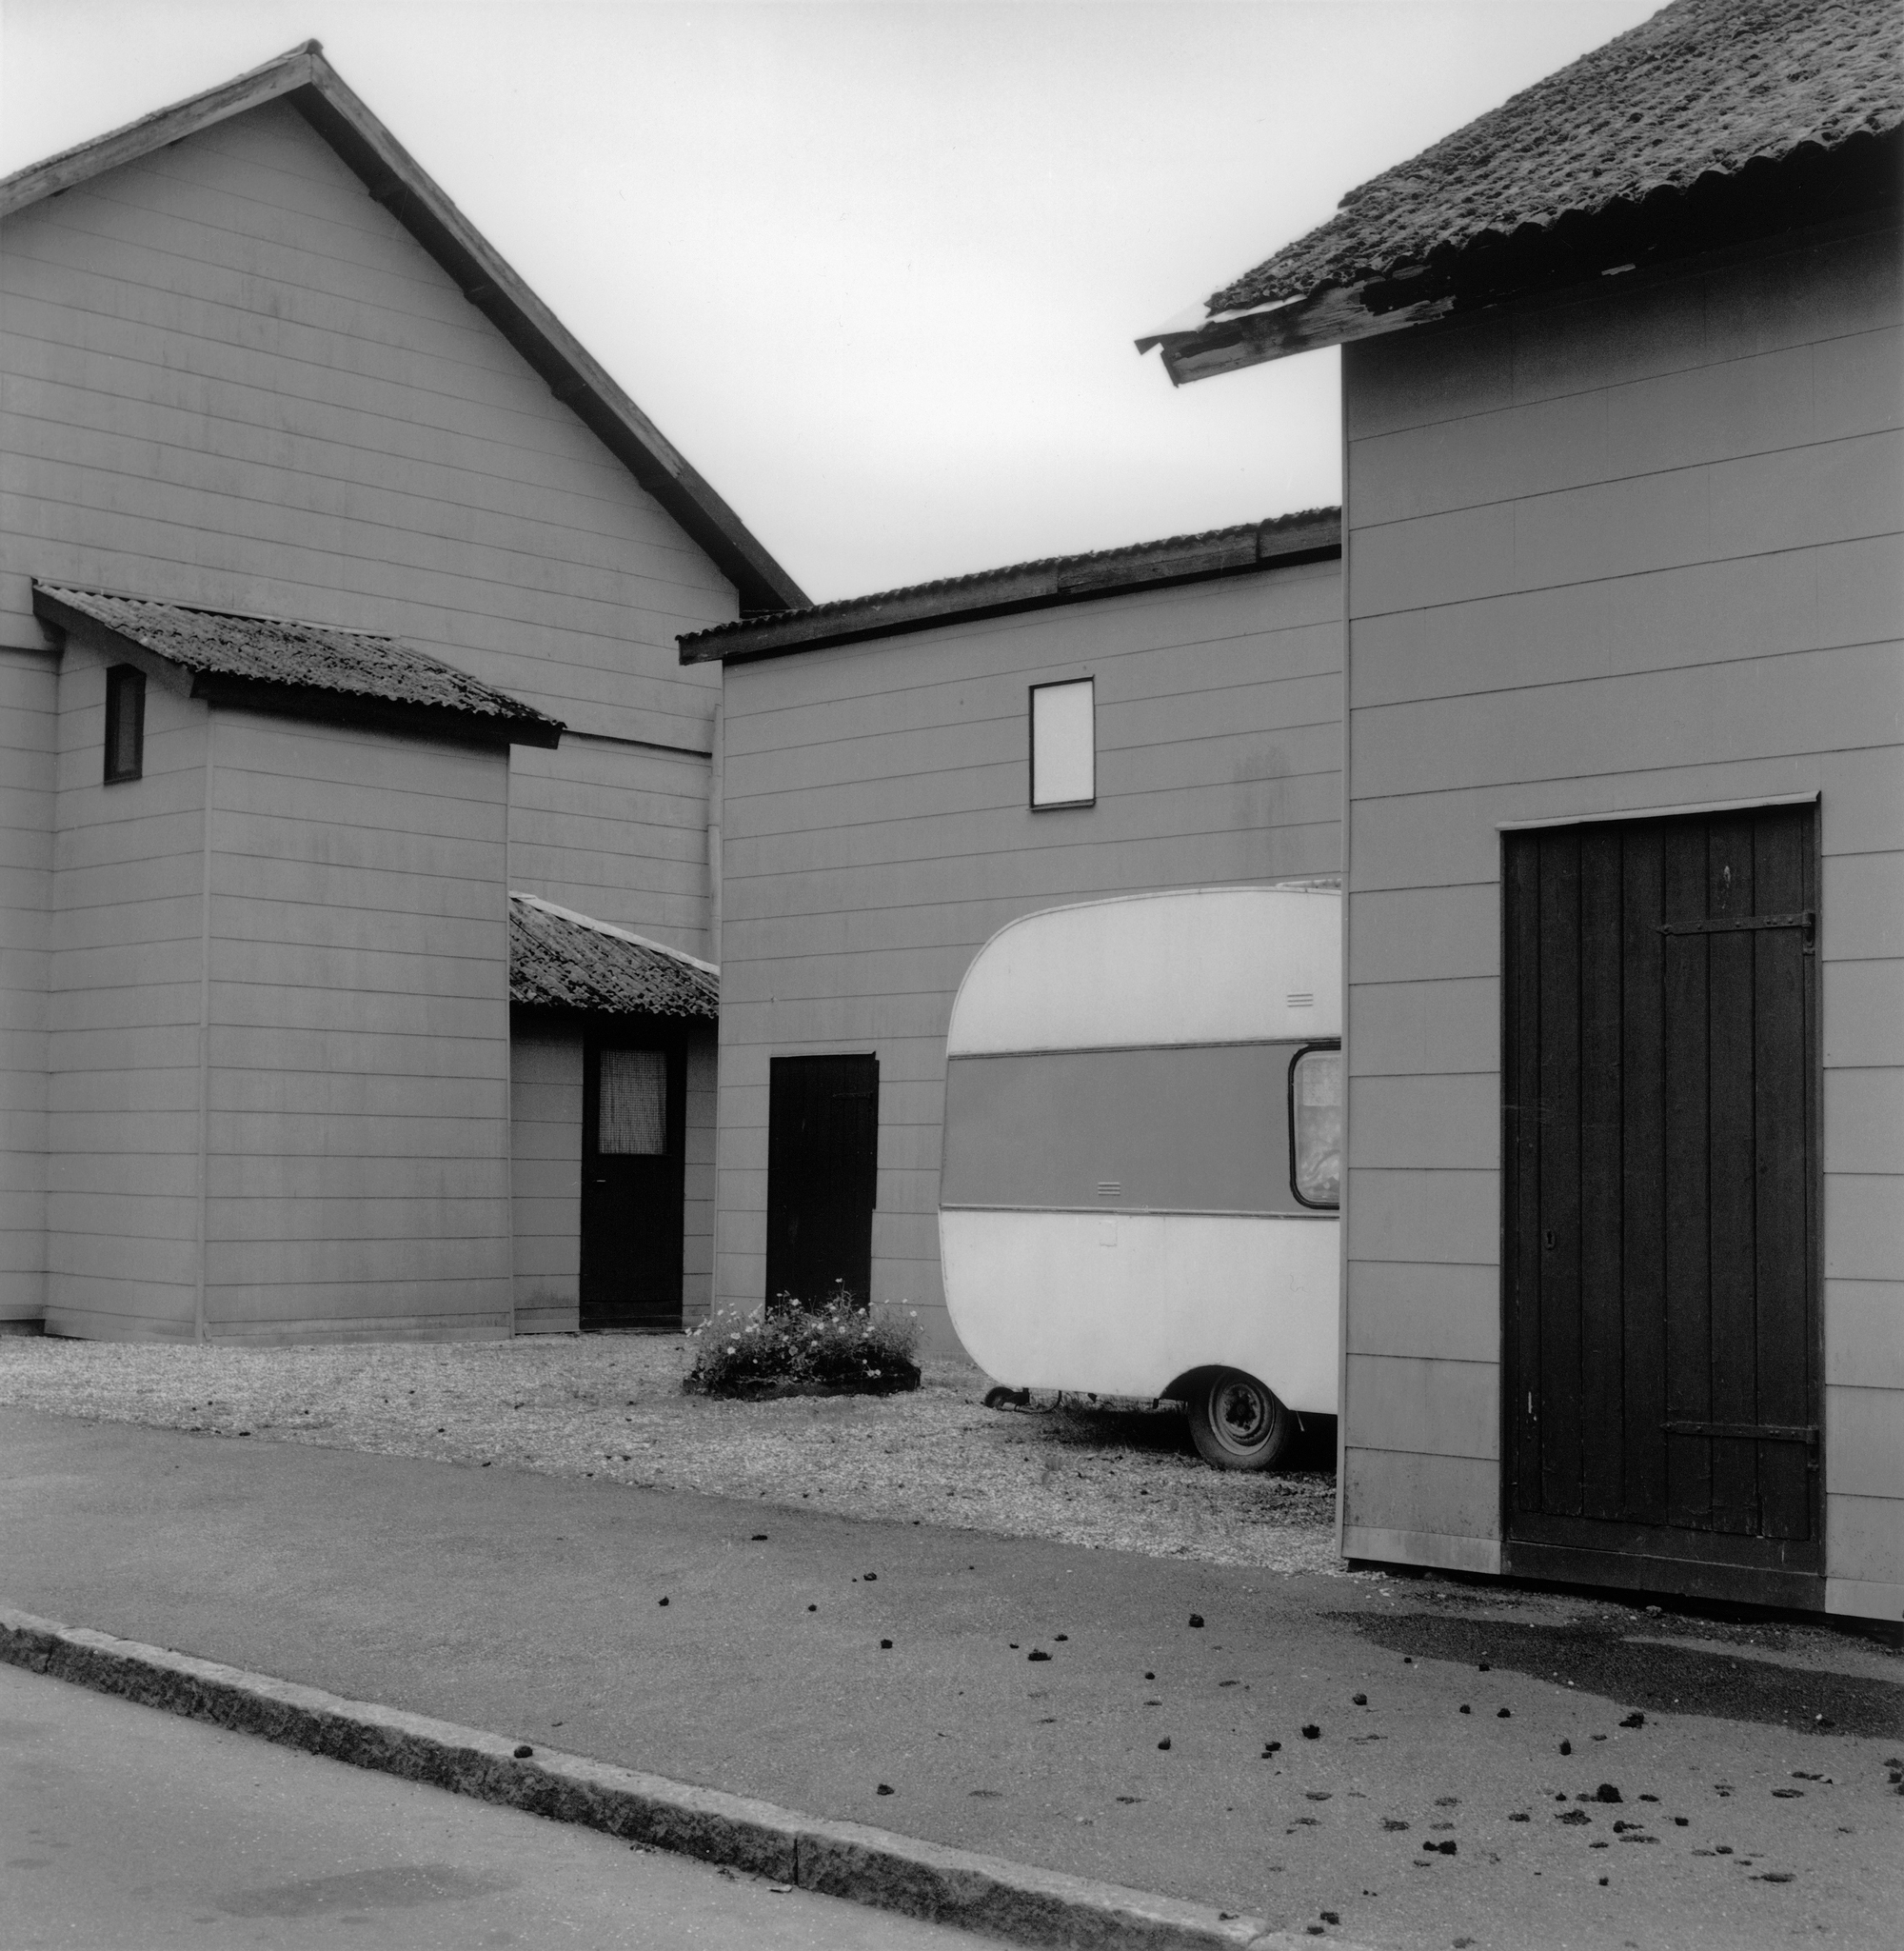 Brålanda, Schweden, 2001 © Gerry Johansson